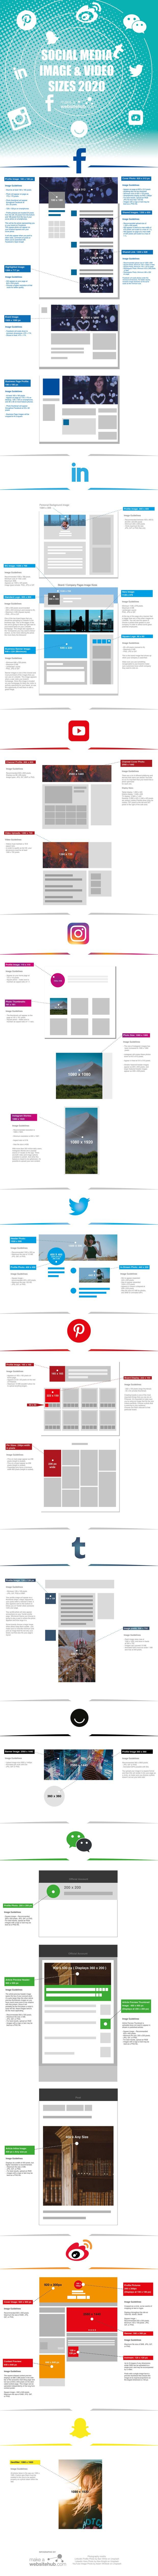 social-media-image-sizes-2018